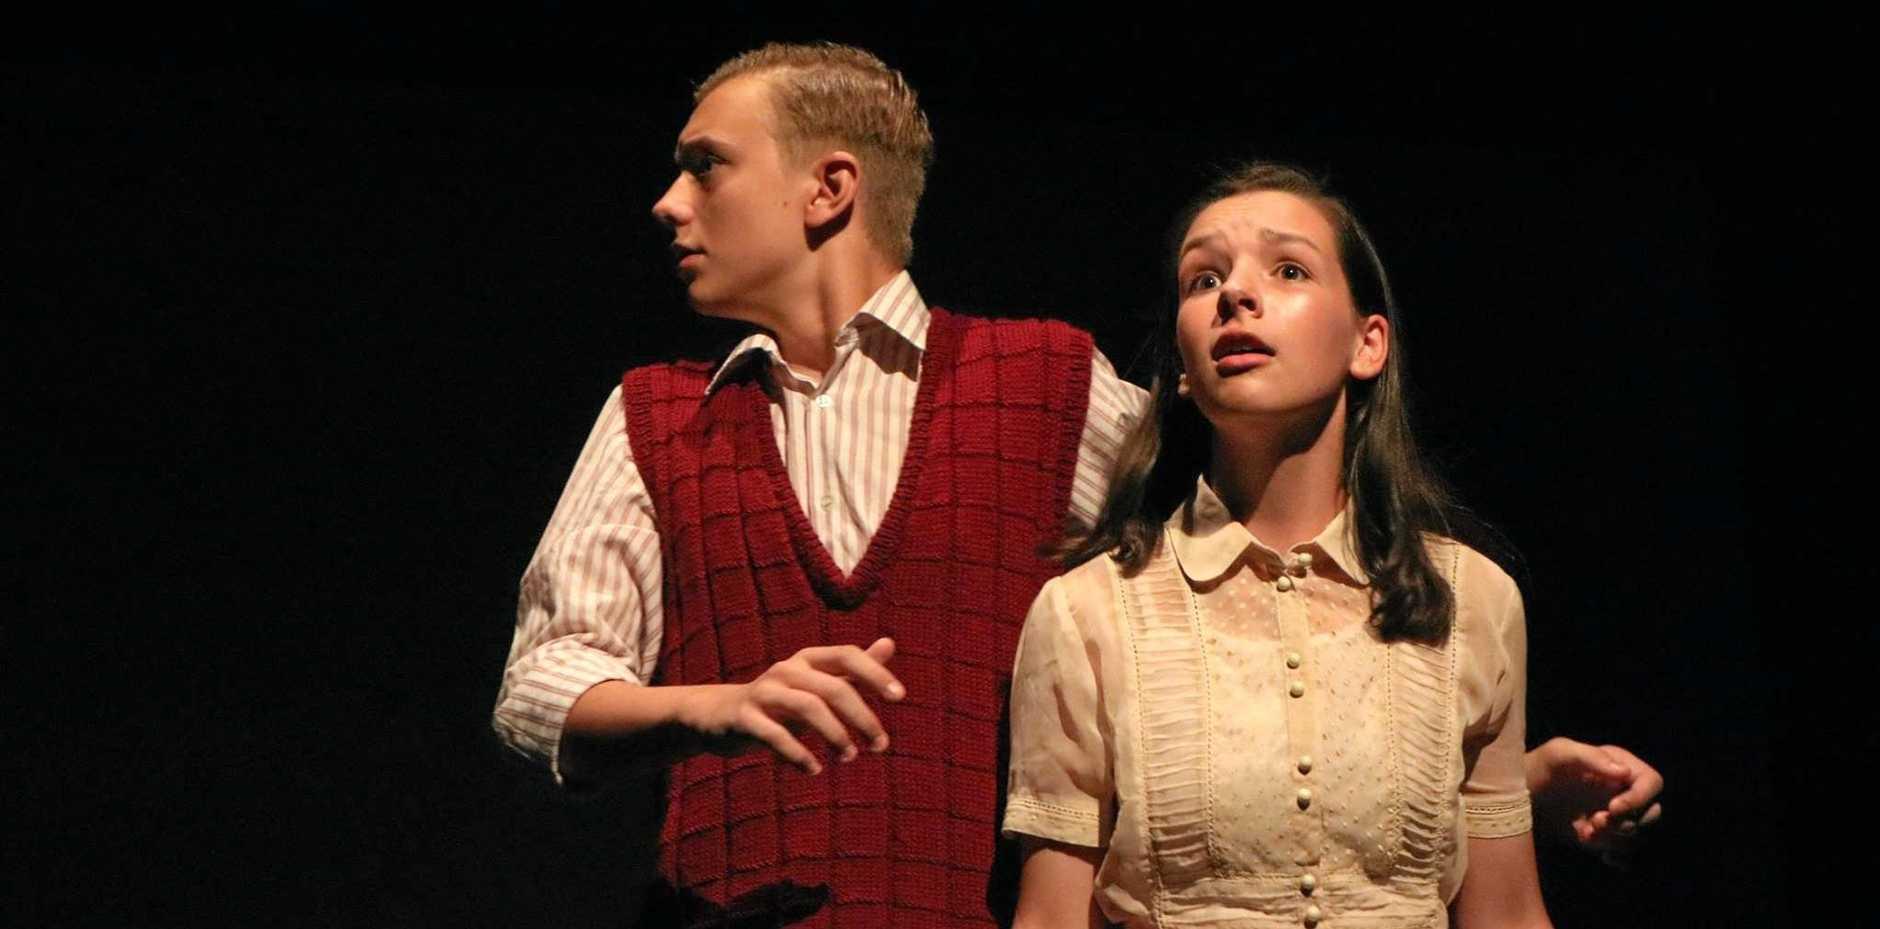 MOVING STORY: Jack de La Haye as Peter Van Daan and Amber Taylor as Anne Frank in The Diary of Anne Frank.